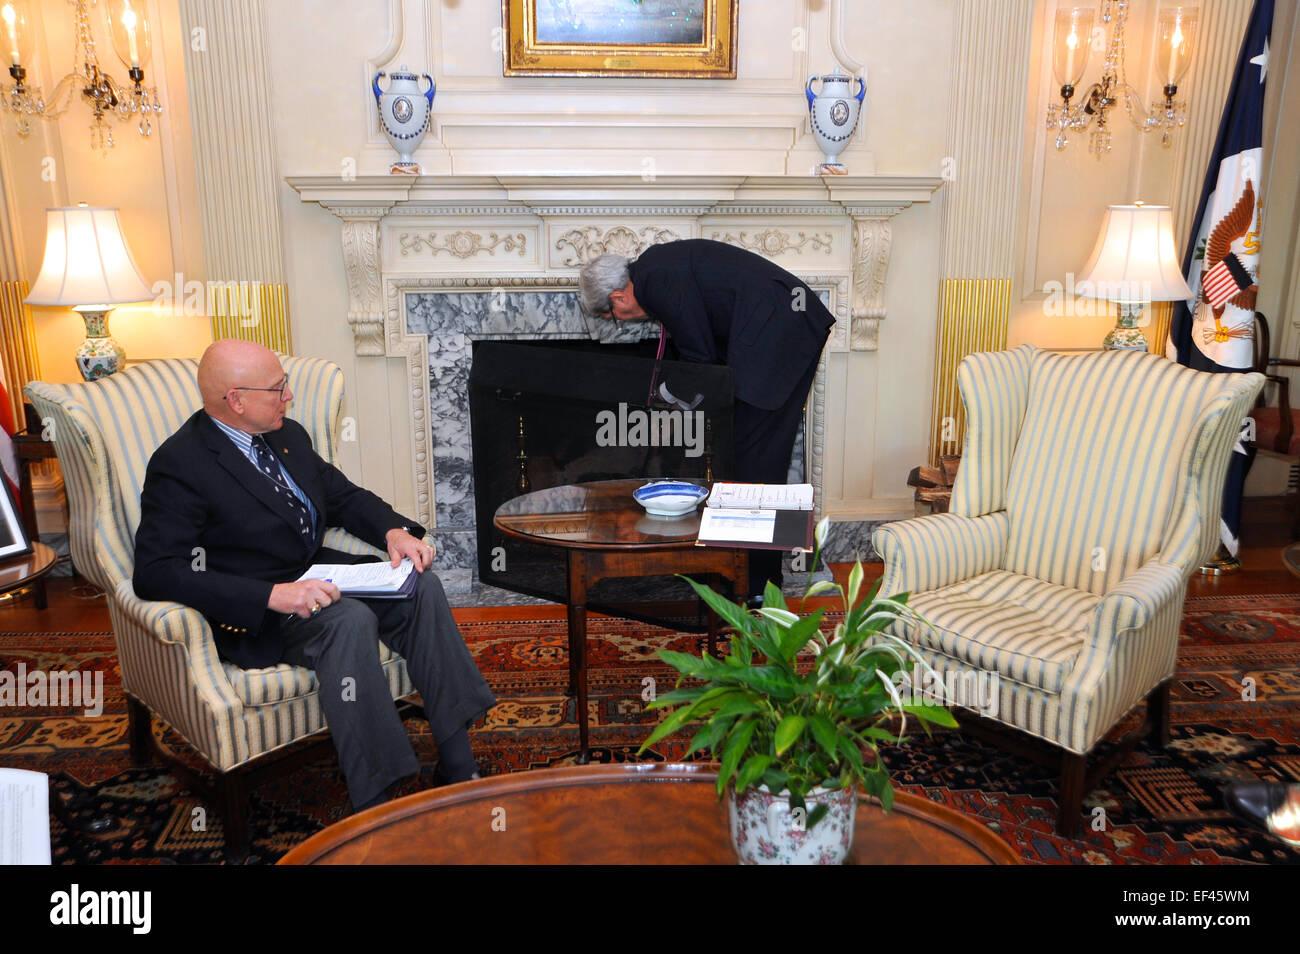 u s secretary of state john kerry stokes firewood in the